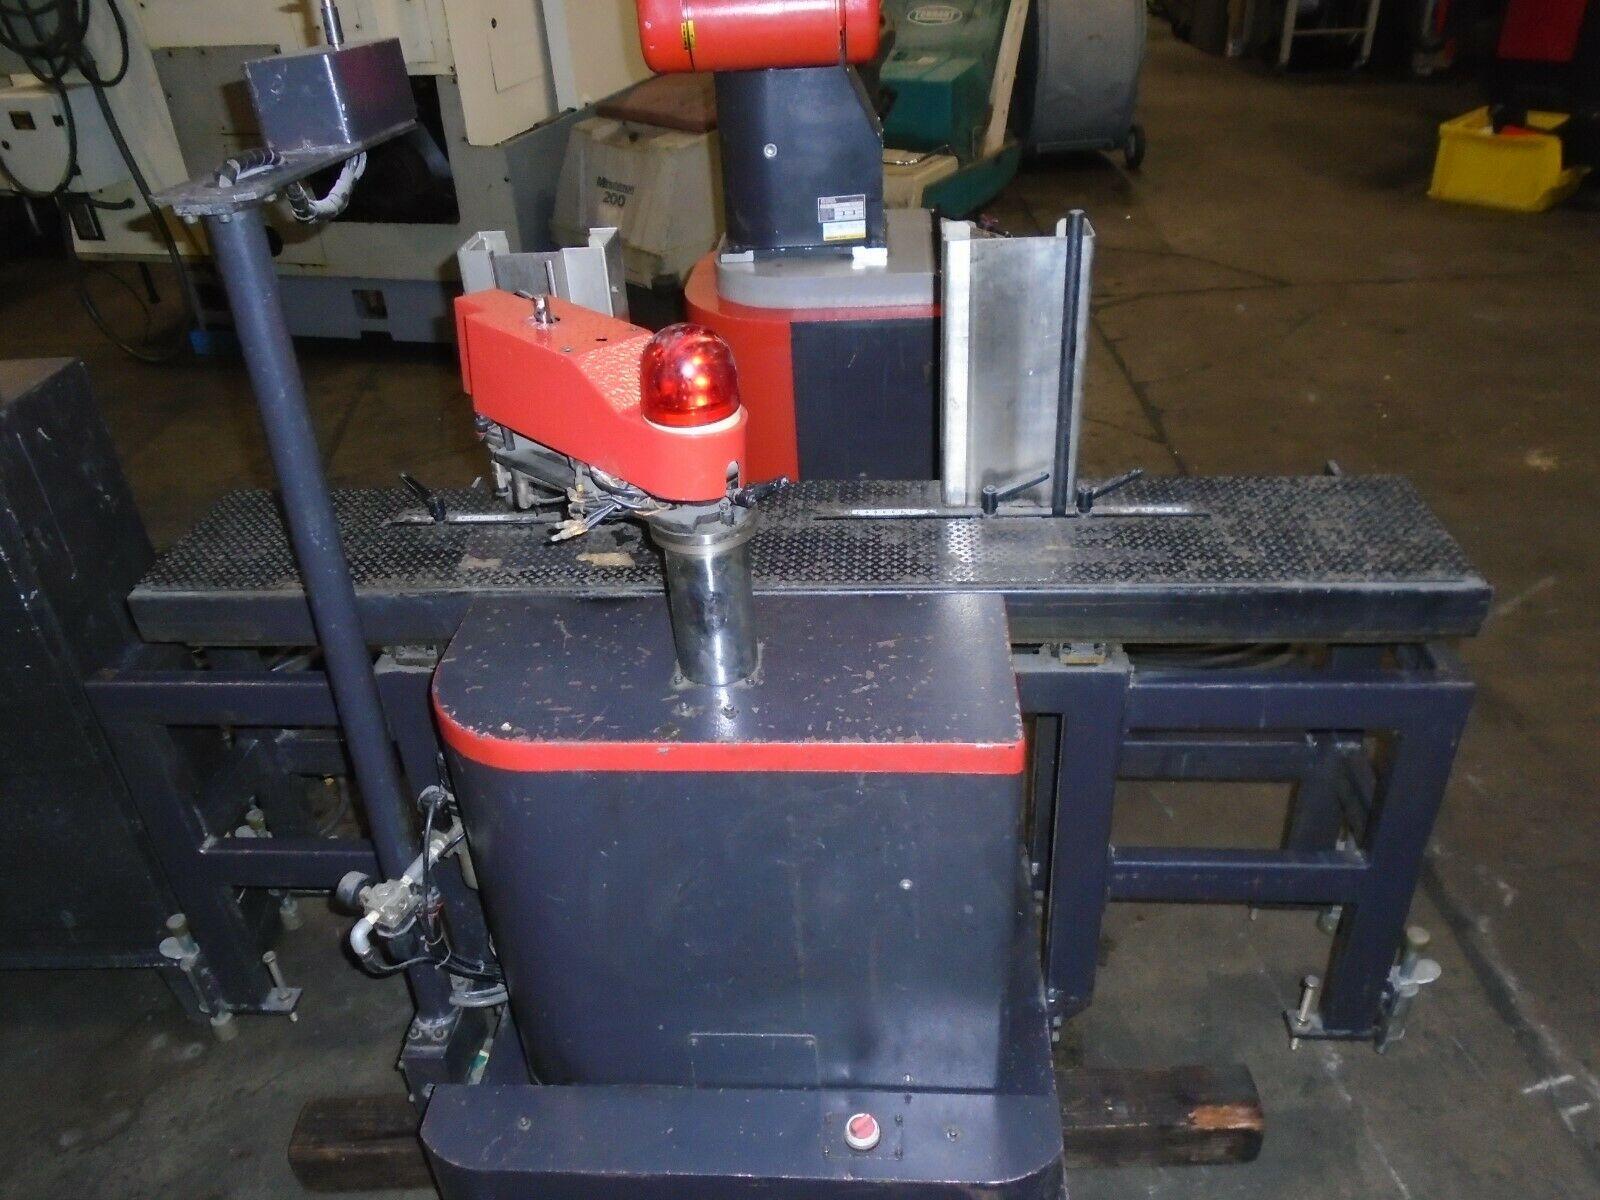 Fanuc Robot LR Mate 100 A5B-1131-8001 Mini Cel R-J2 Control - Image 6 of 12